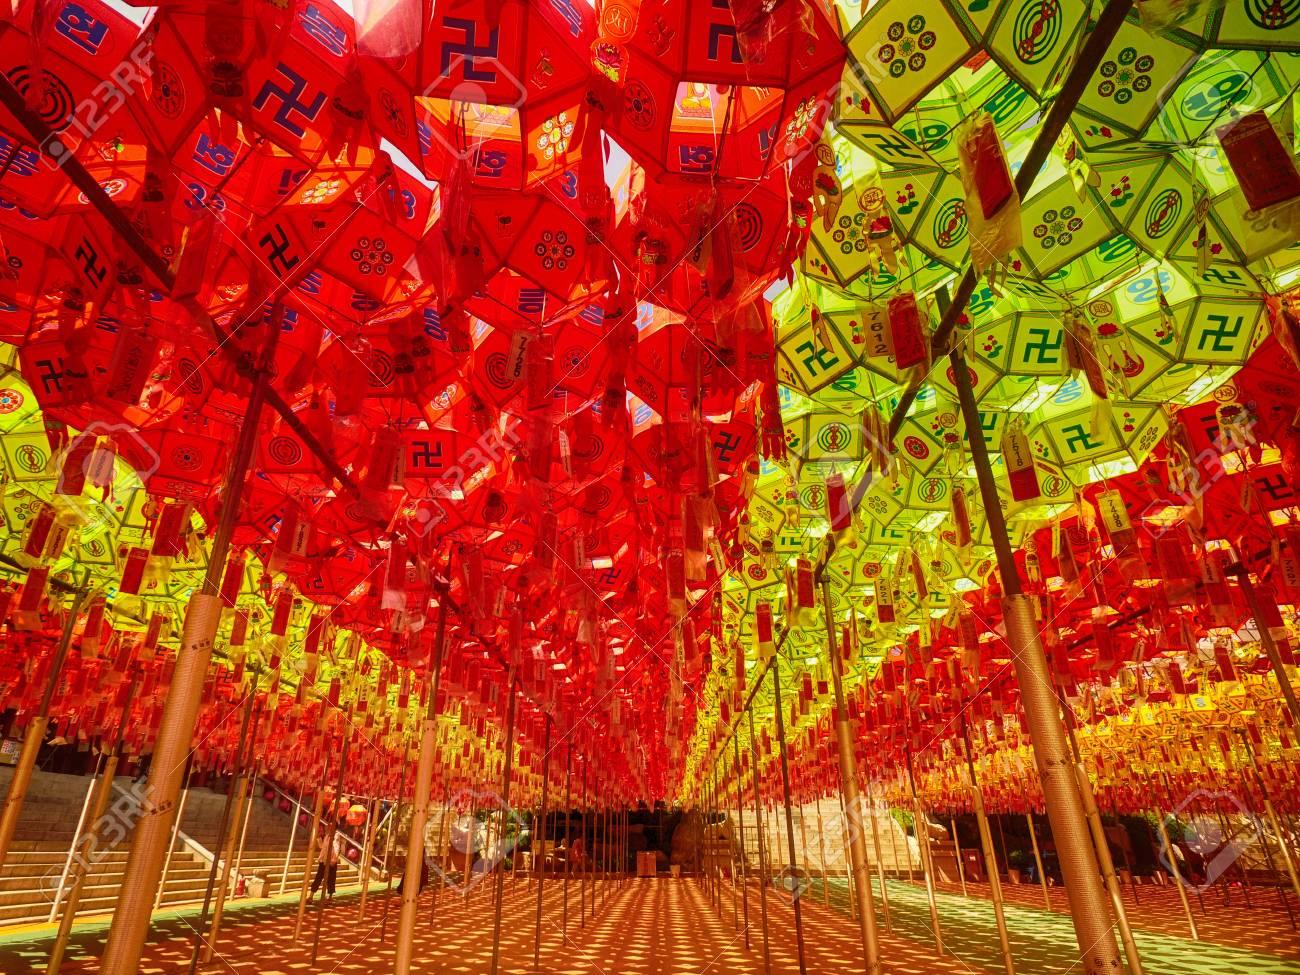 Lotus Lantern Festival In Samgwangsa Temple Busan South Korea Stock Photo Picture And Royalty Free Image Image 101872074